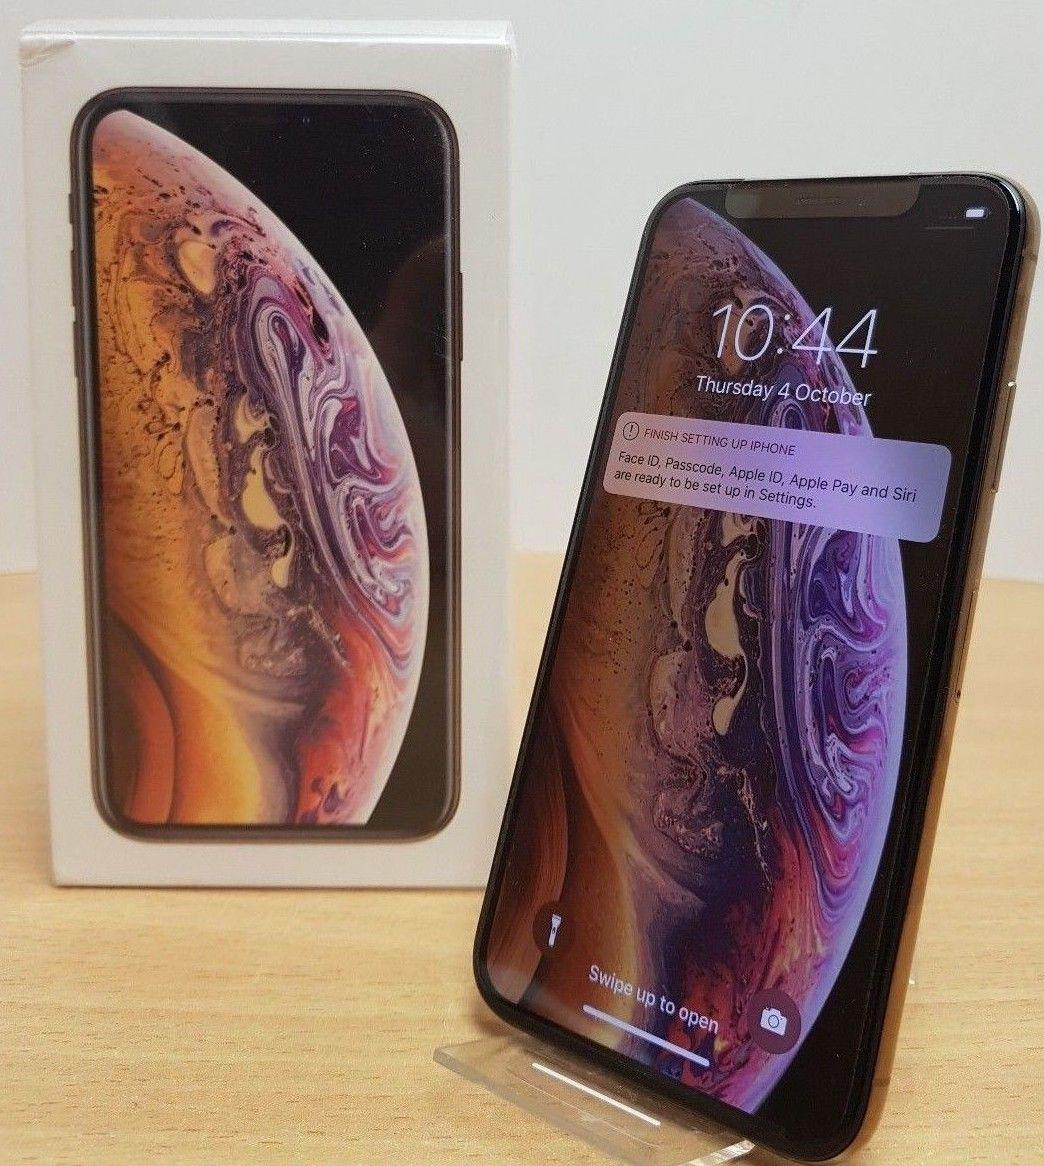 Apple iPhone XS 64GB = 400 EUR  ,iPhone XS Max 64GB = 430 EUR ,iPhone X 64GB = 300 EUR,Apple iPhone XR 64GB = 350 Euro , WHATSAPP CHAT : +27837724253